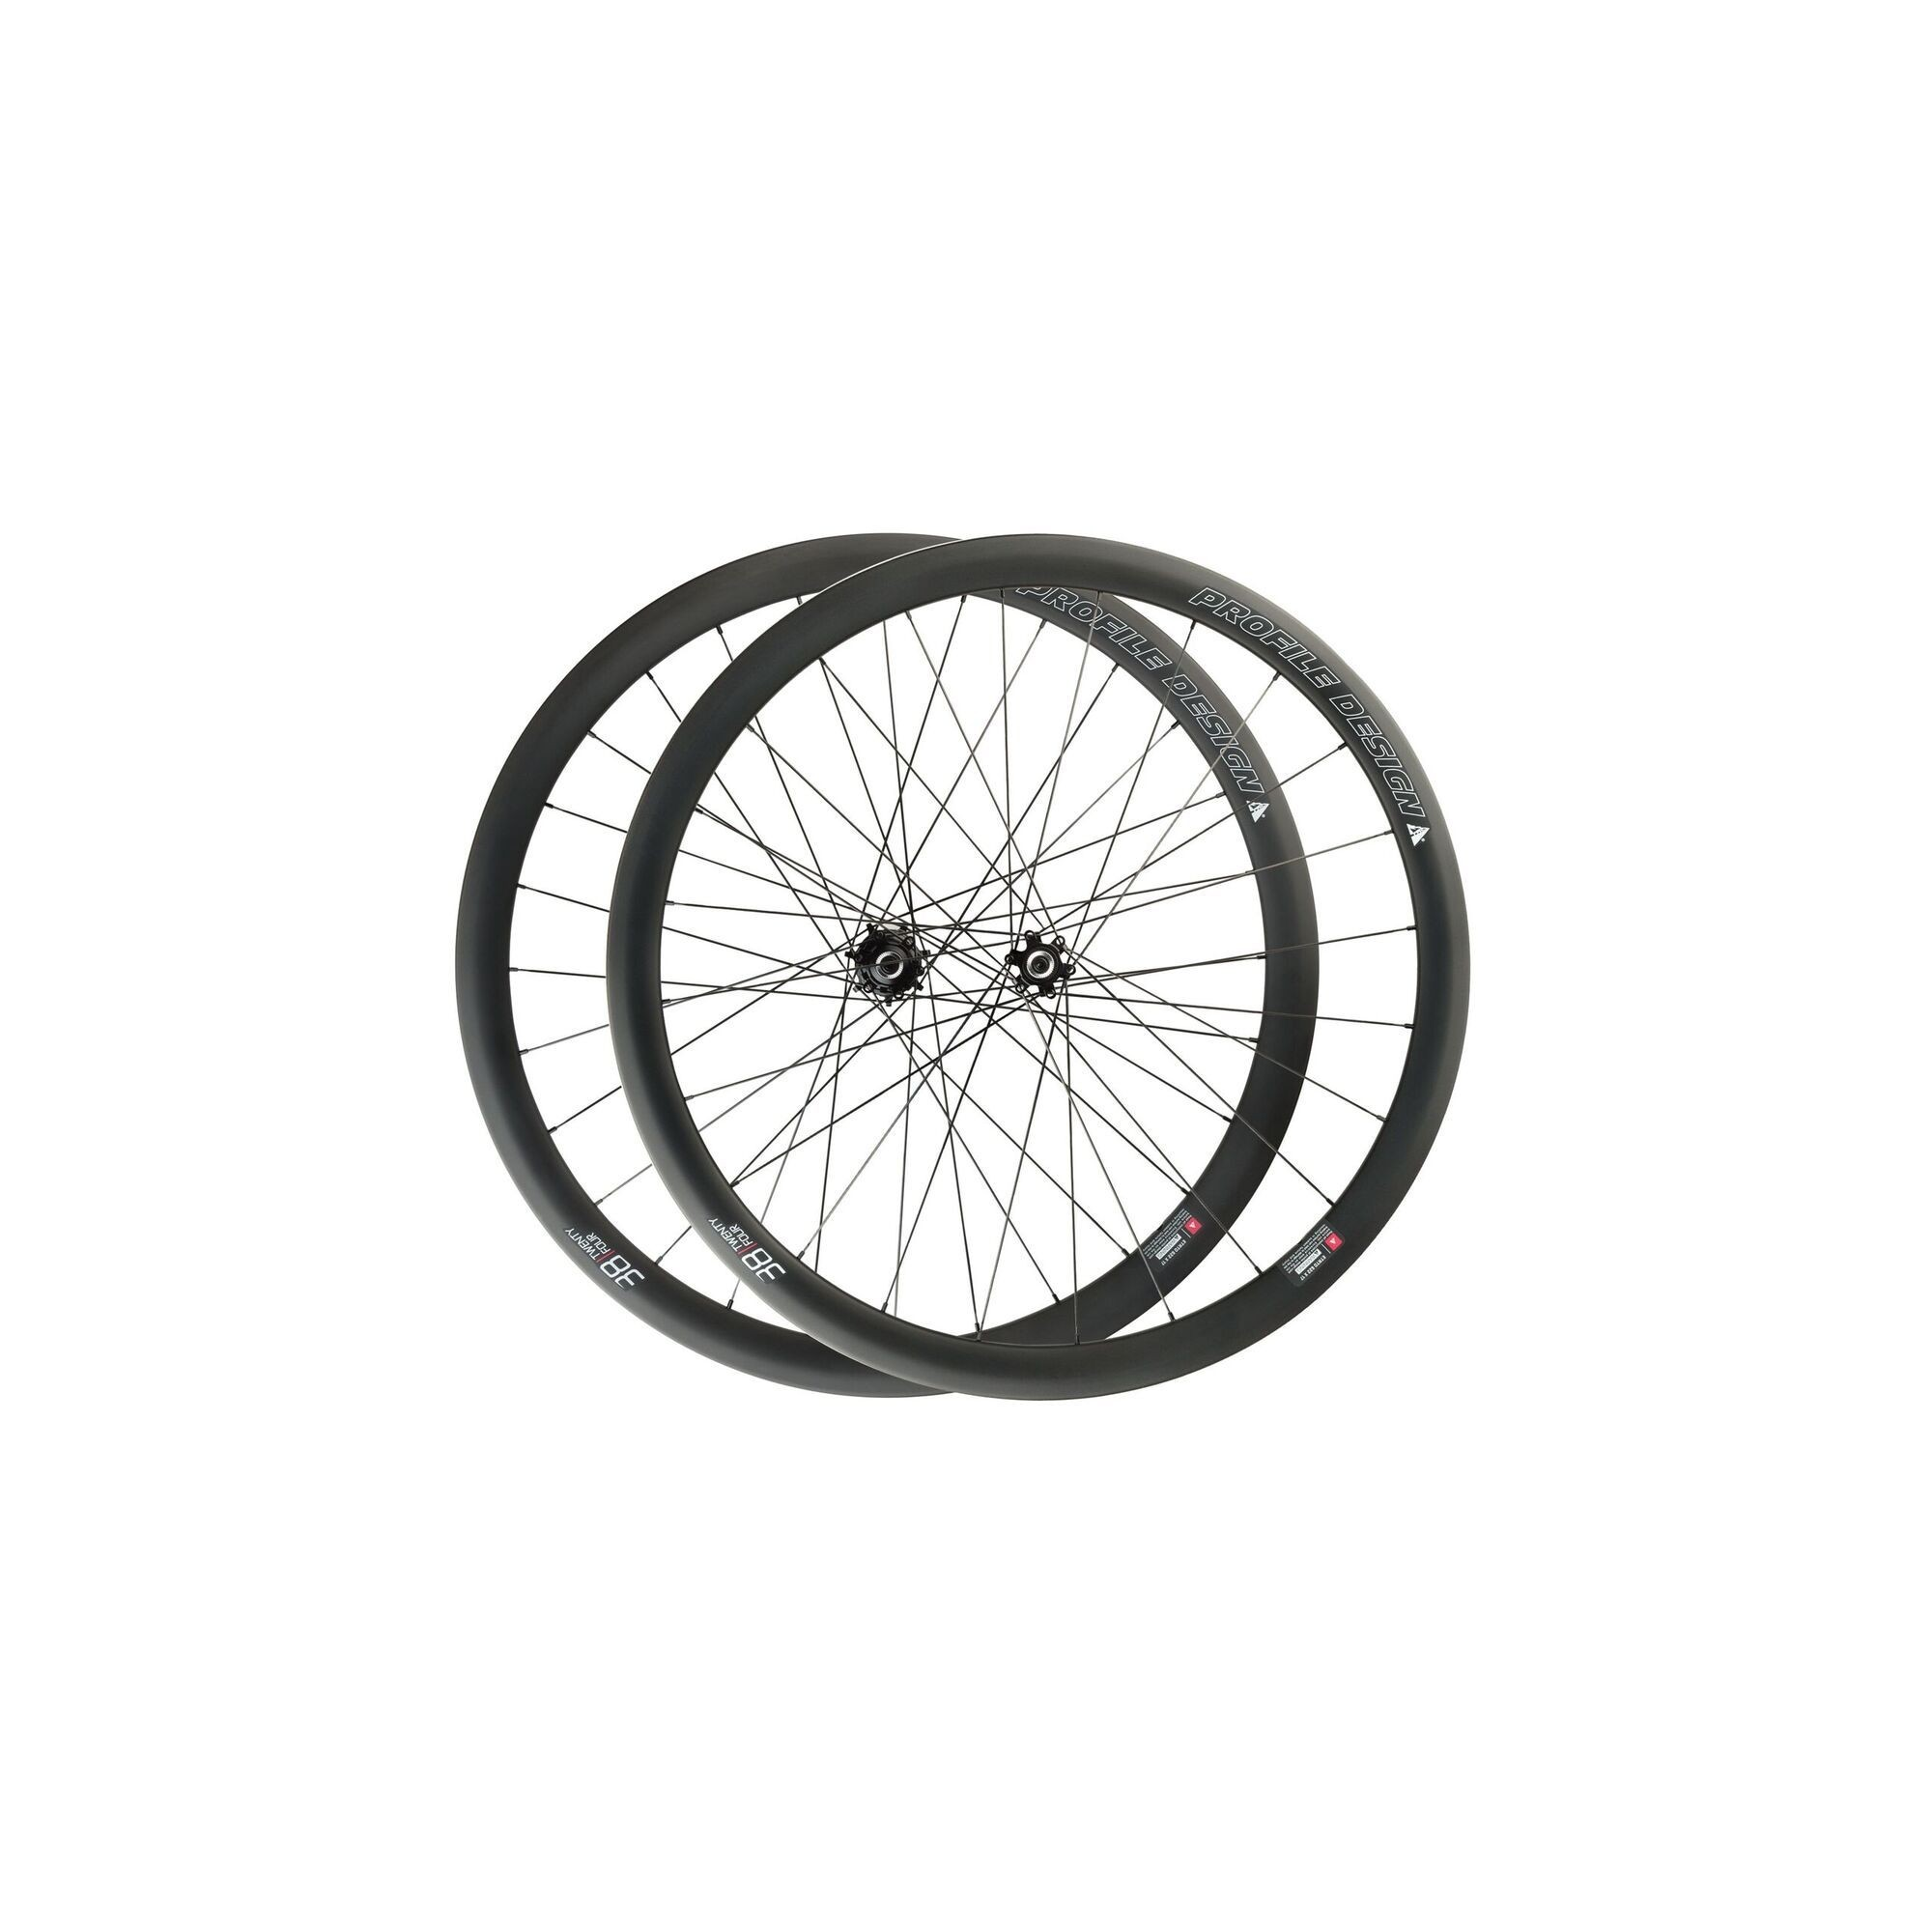 Paire de roues disques Profile Design 38 à pneus veloseine